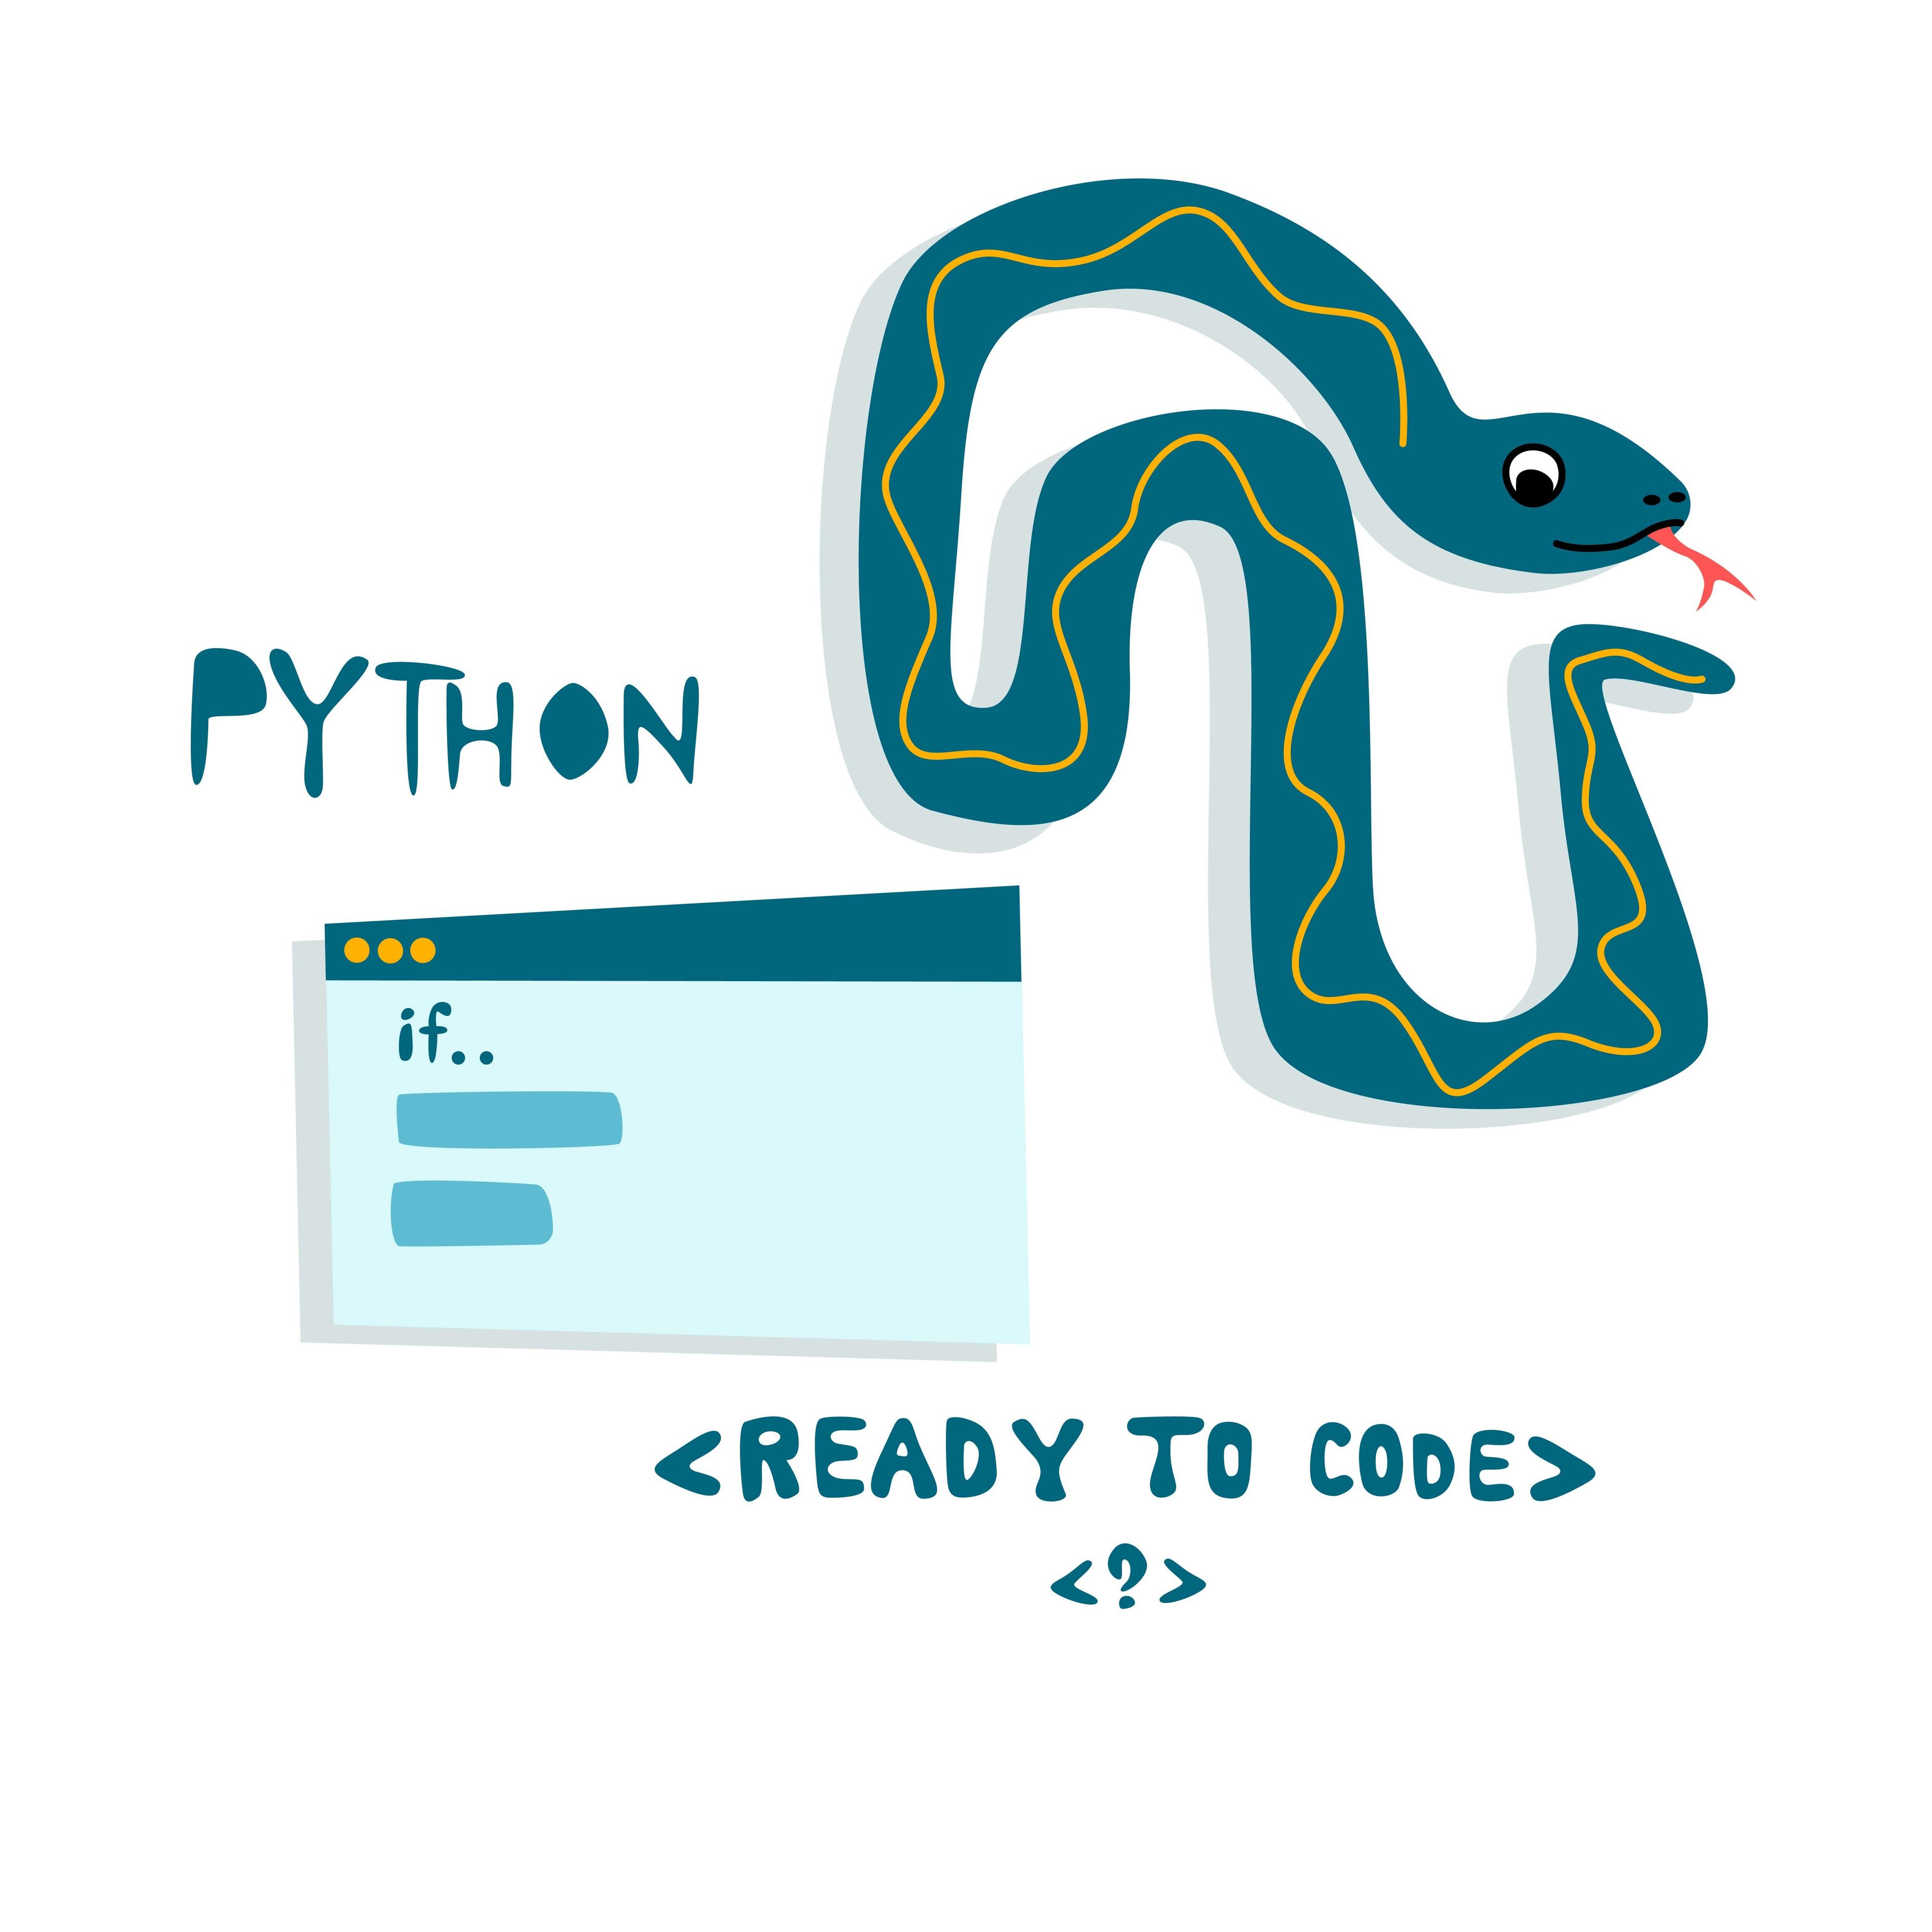 Week 4: Intro to Python (2pm, Jared)